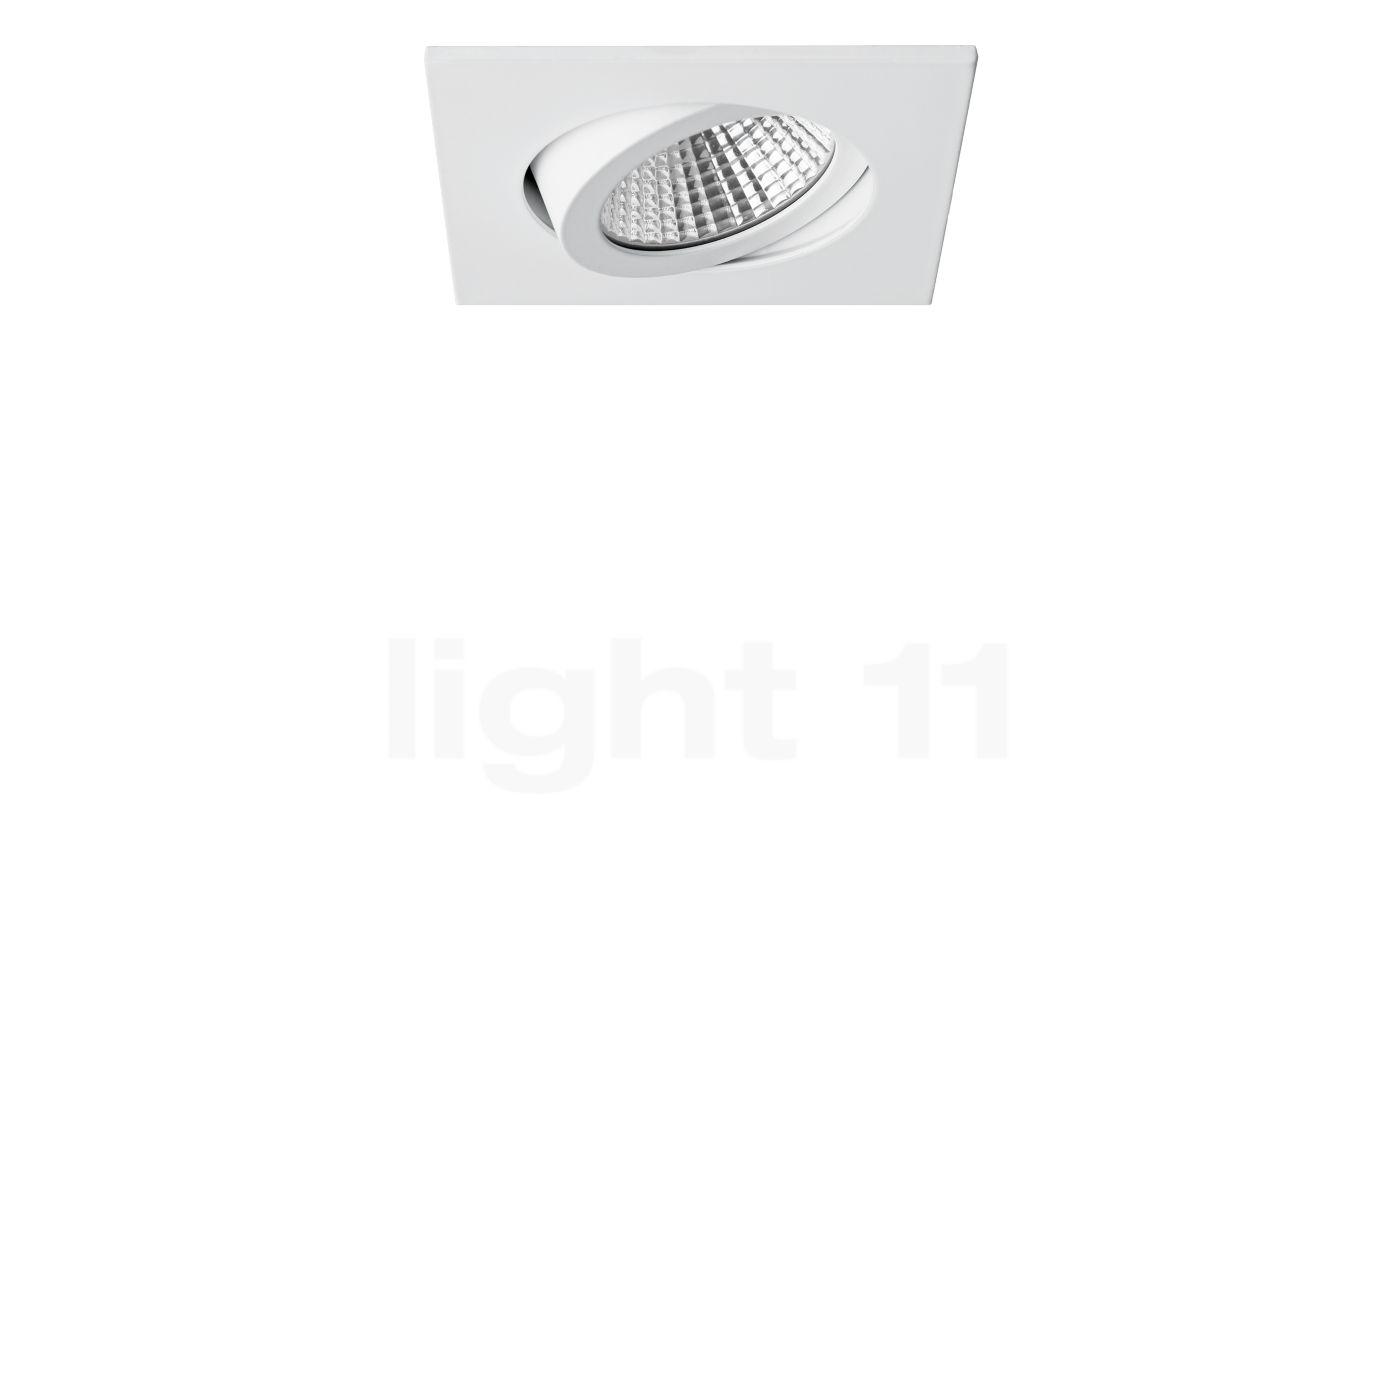 Brumberg 39462 - Einbaustrahler LED dim to warm, weiß 39462073